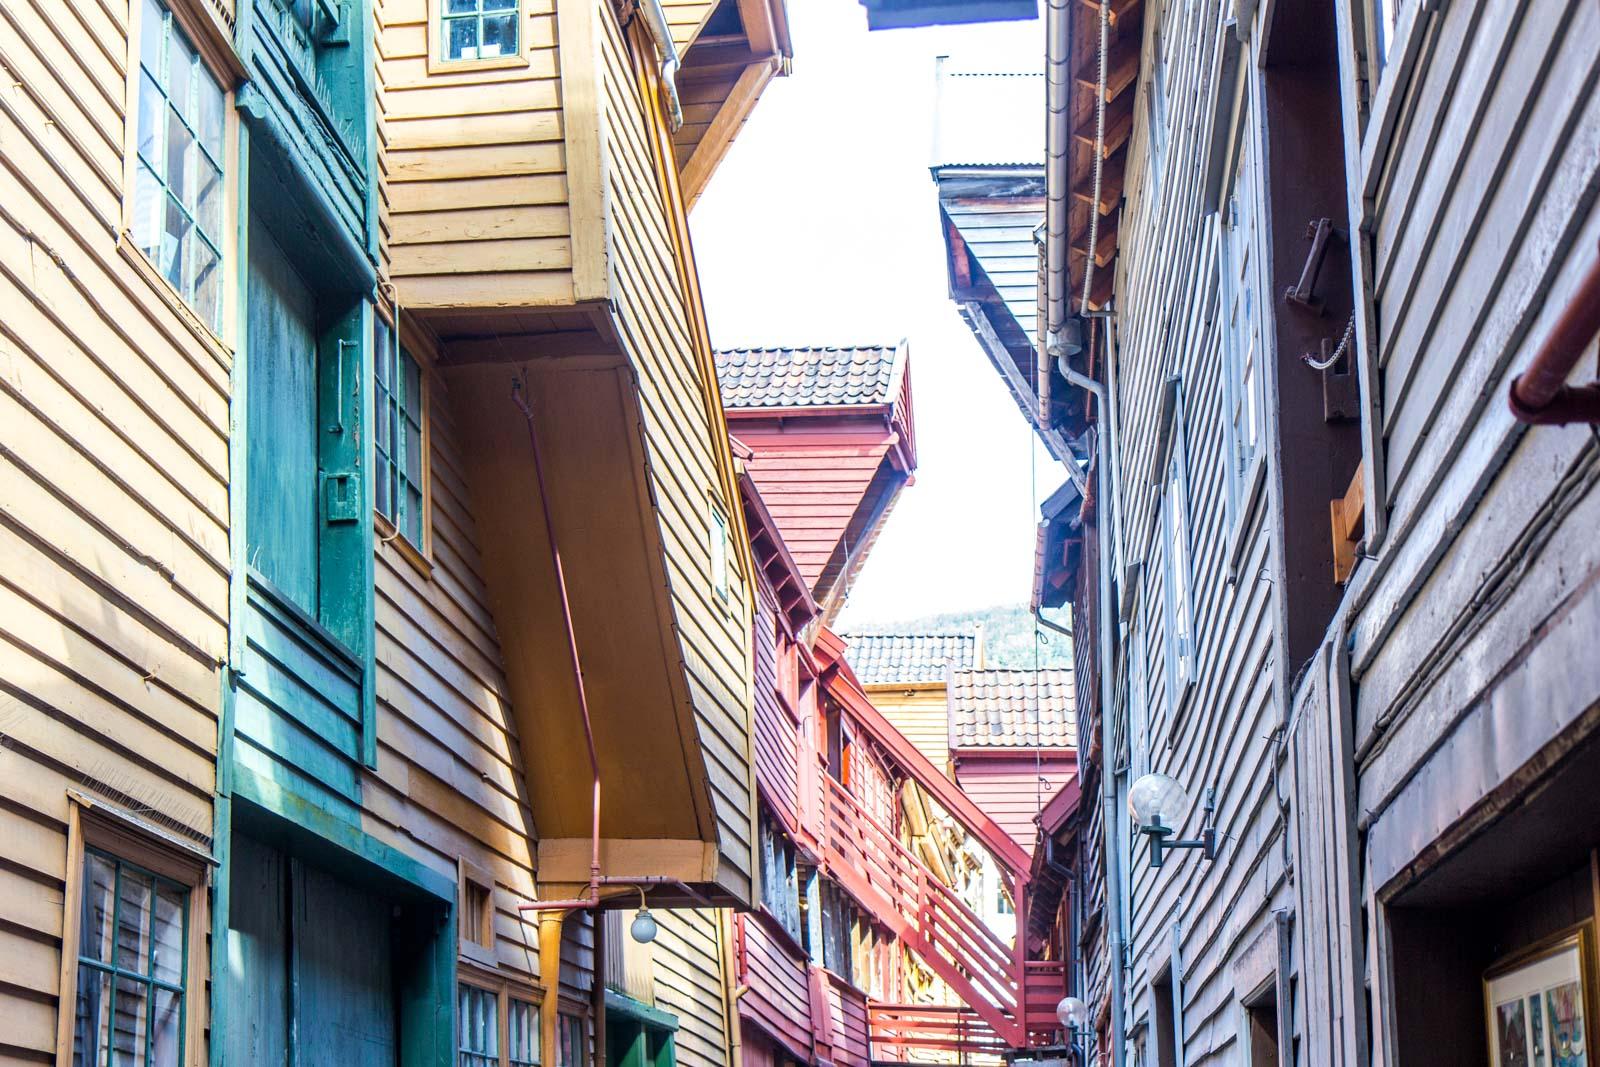 Bryggen wharf, Bergen, Norway